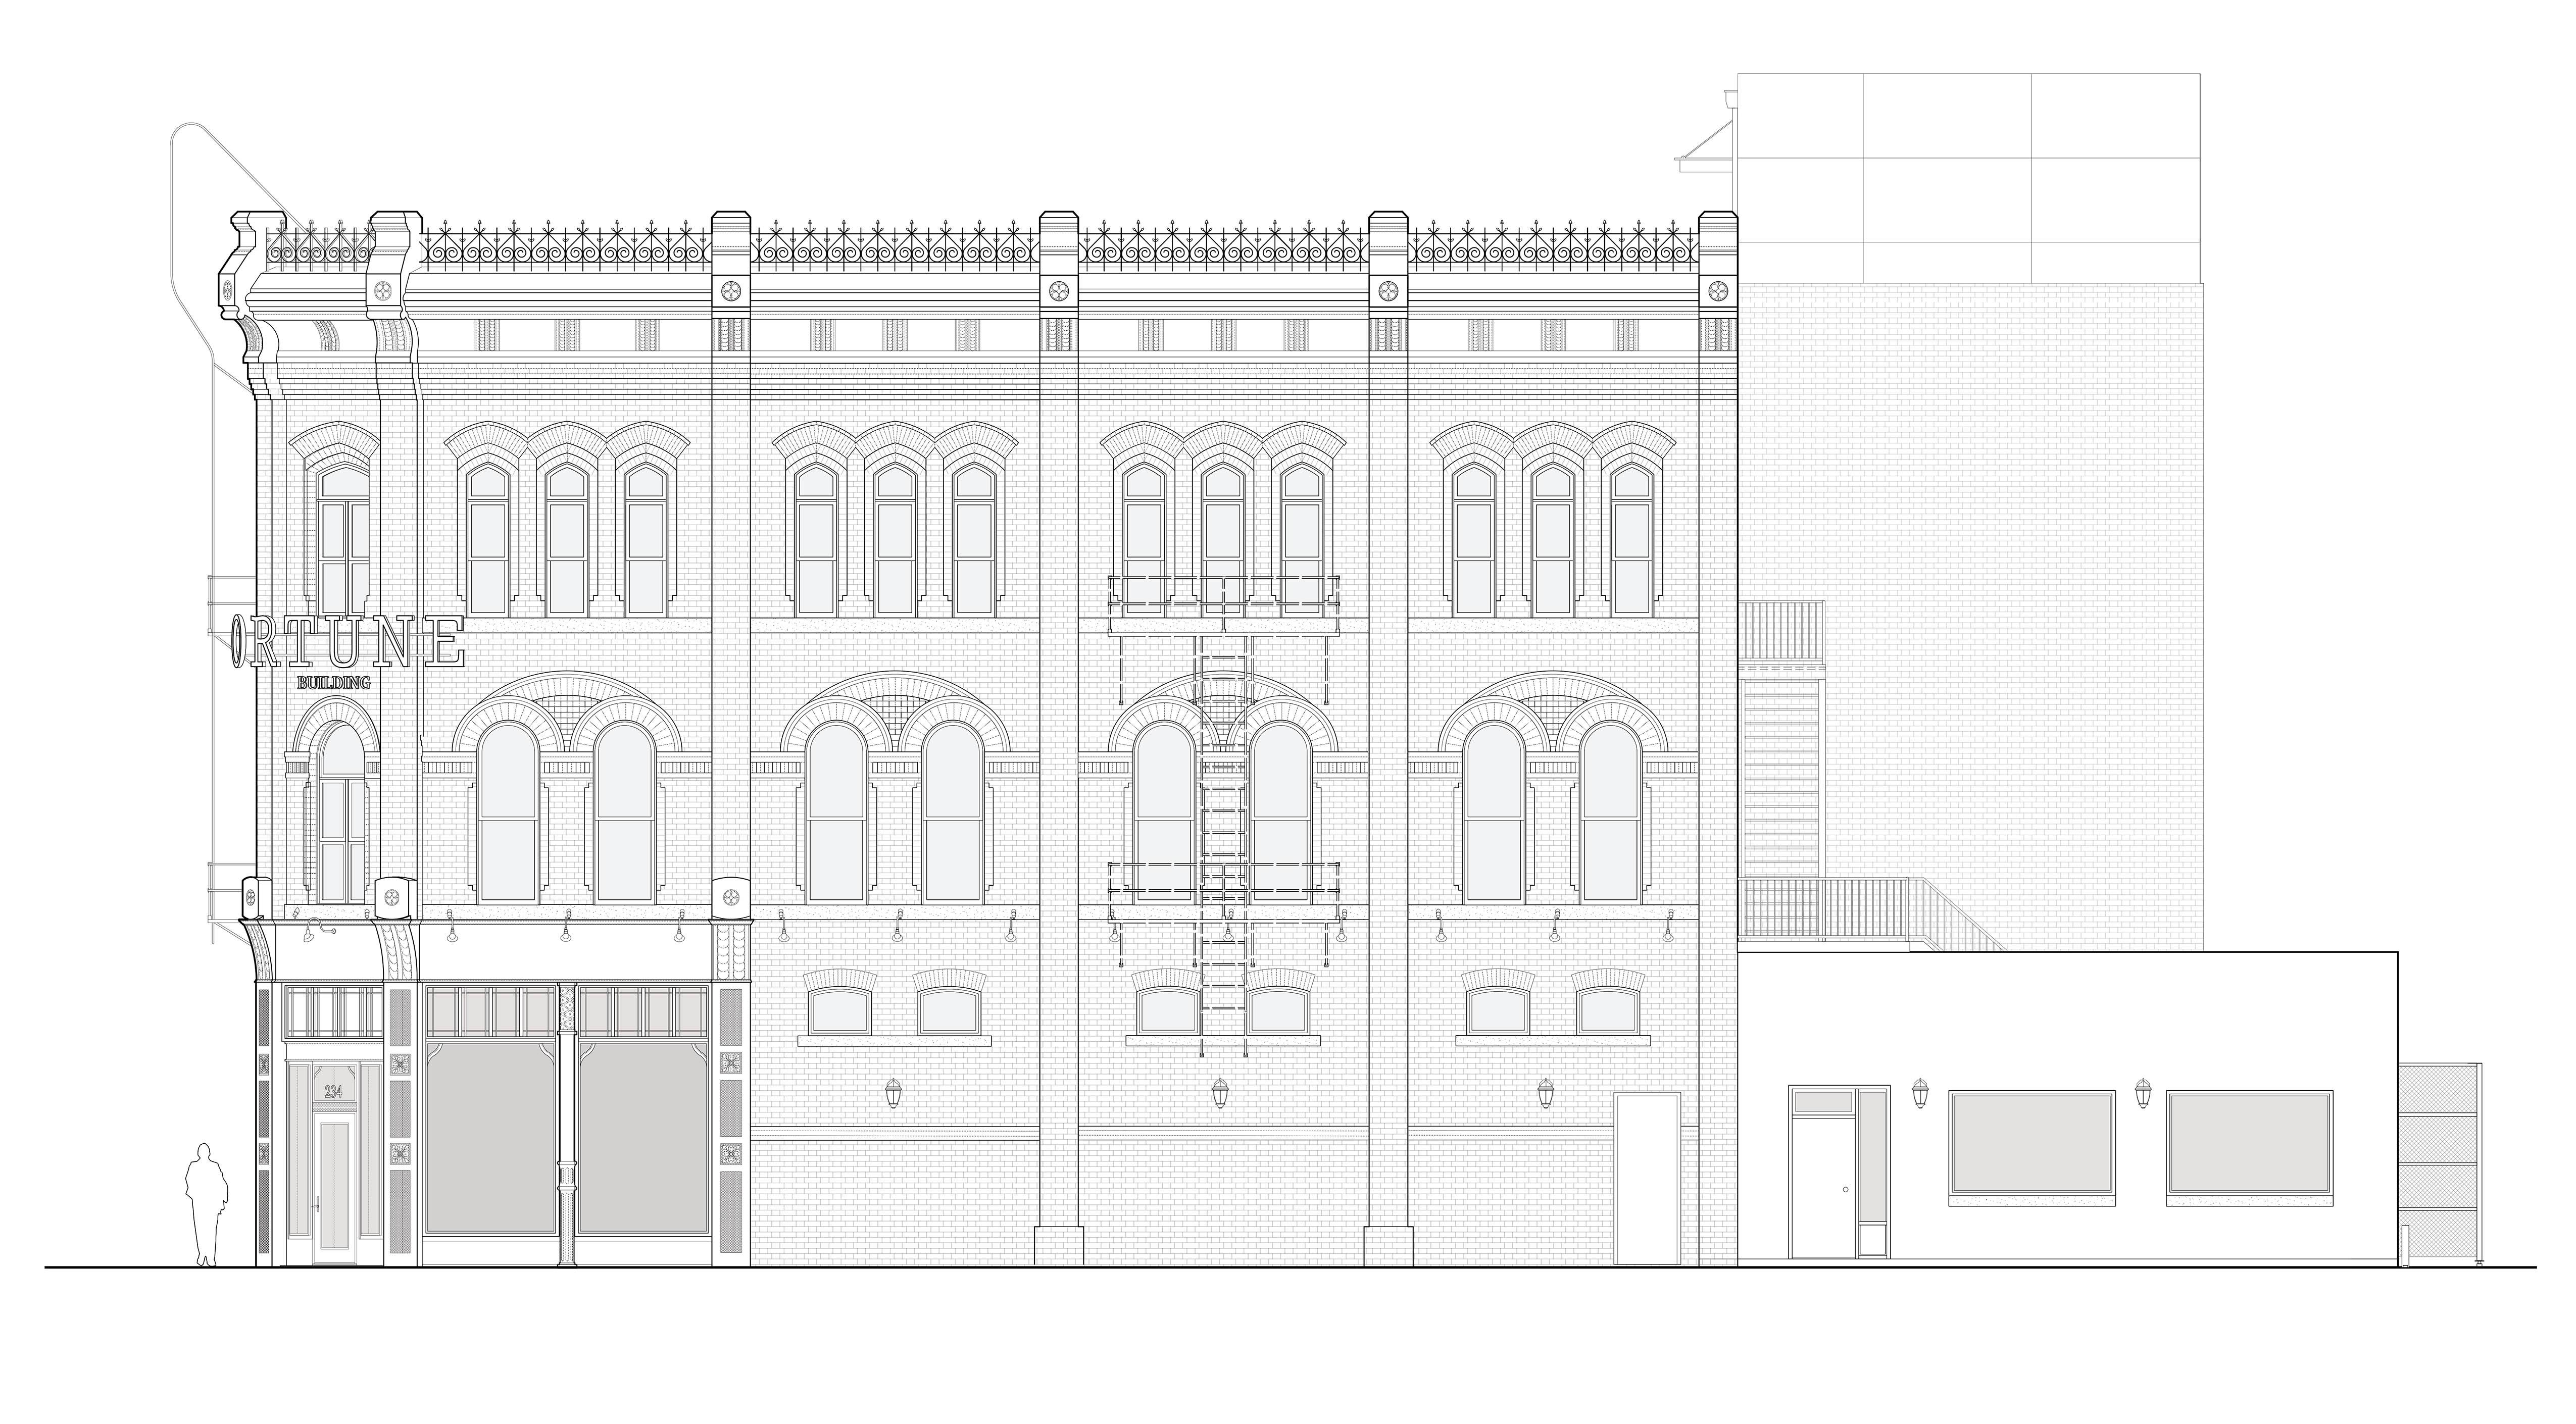 Unit 7 Architecture | Projects - Fortune Building